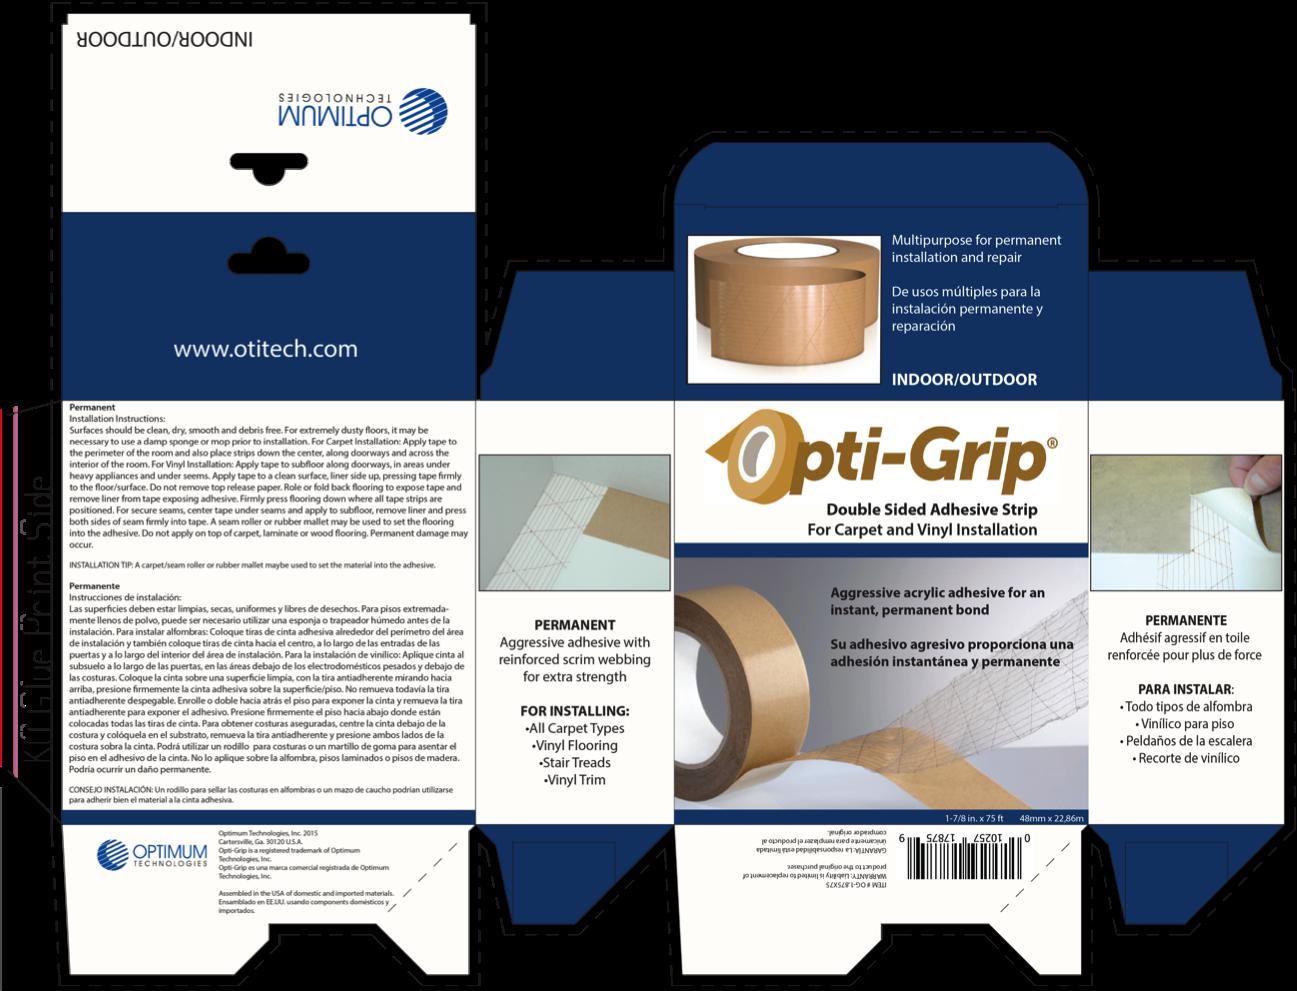 Opti-Grip_Retail_Packaging.png